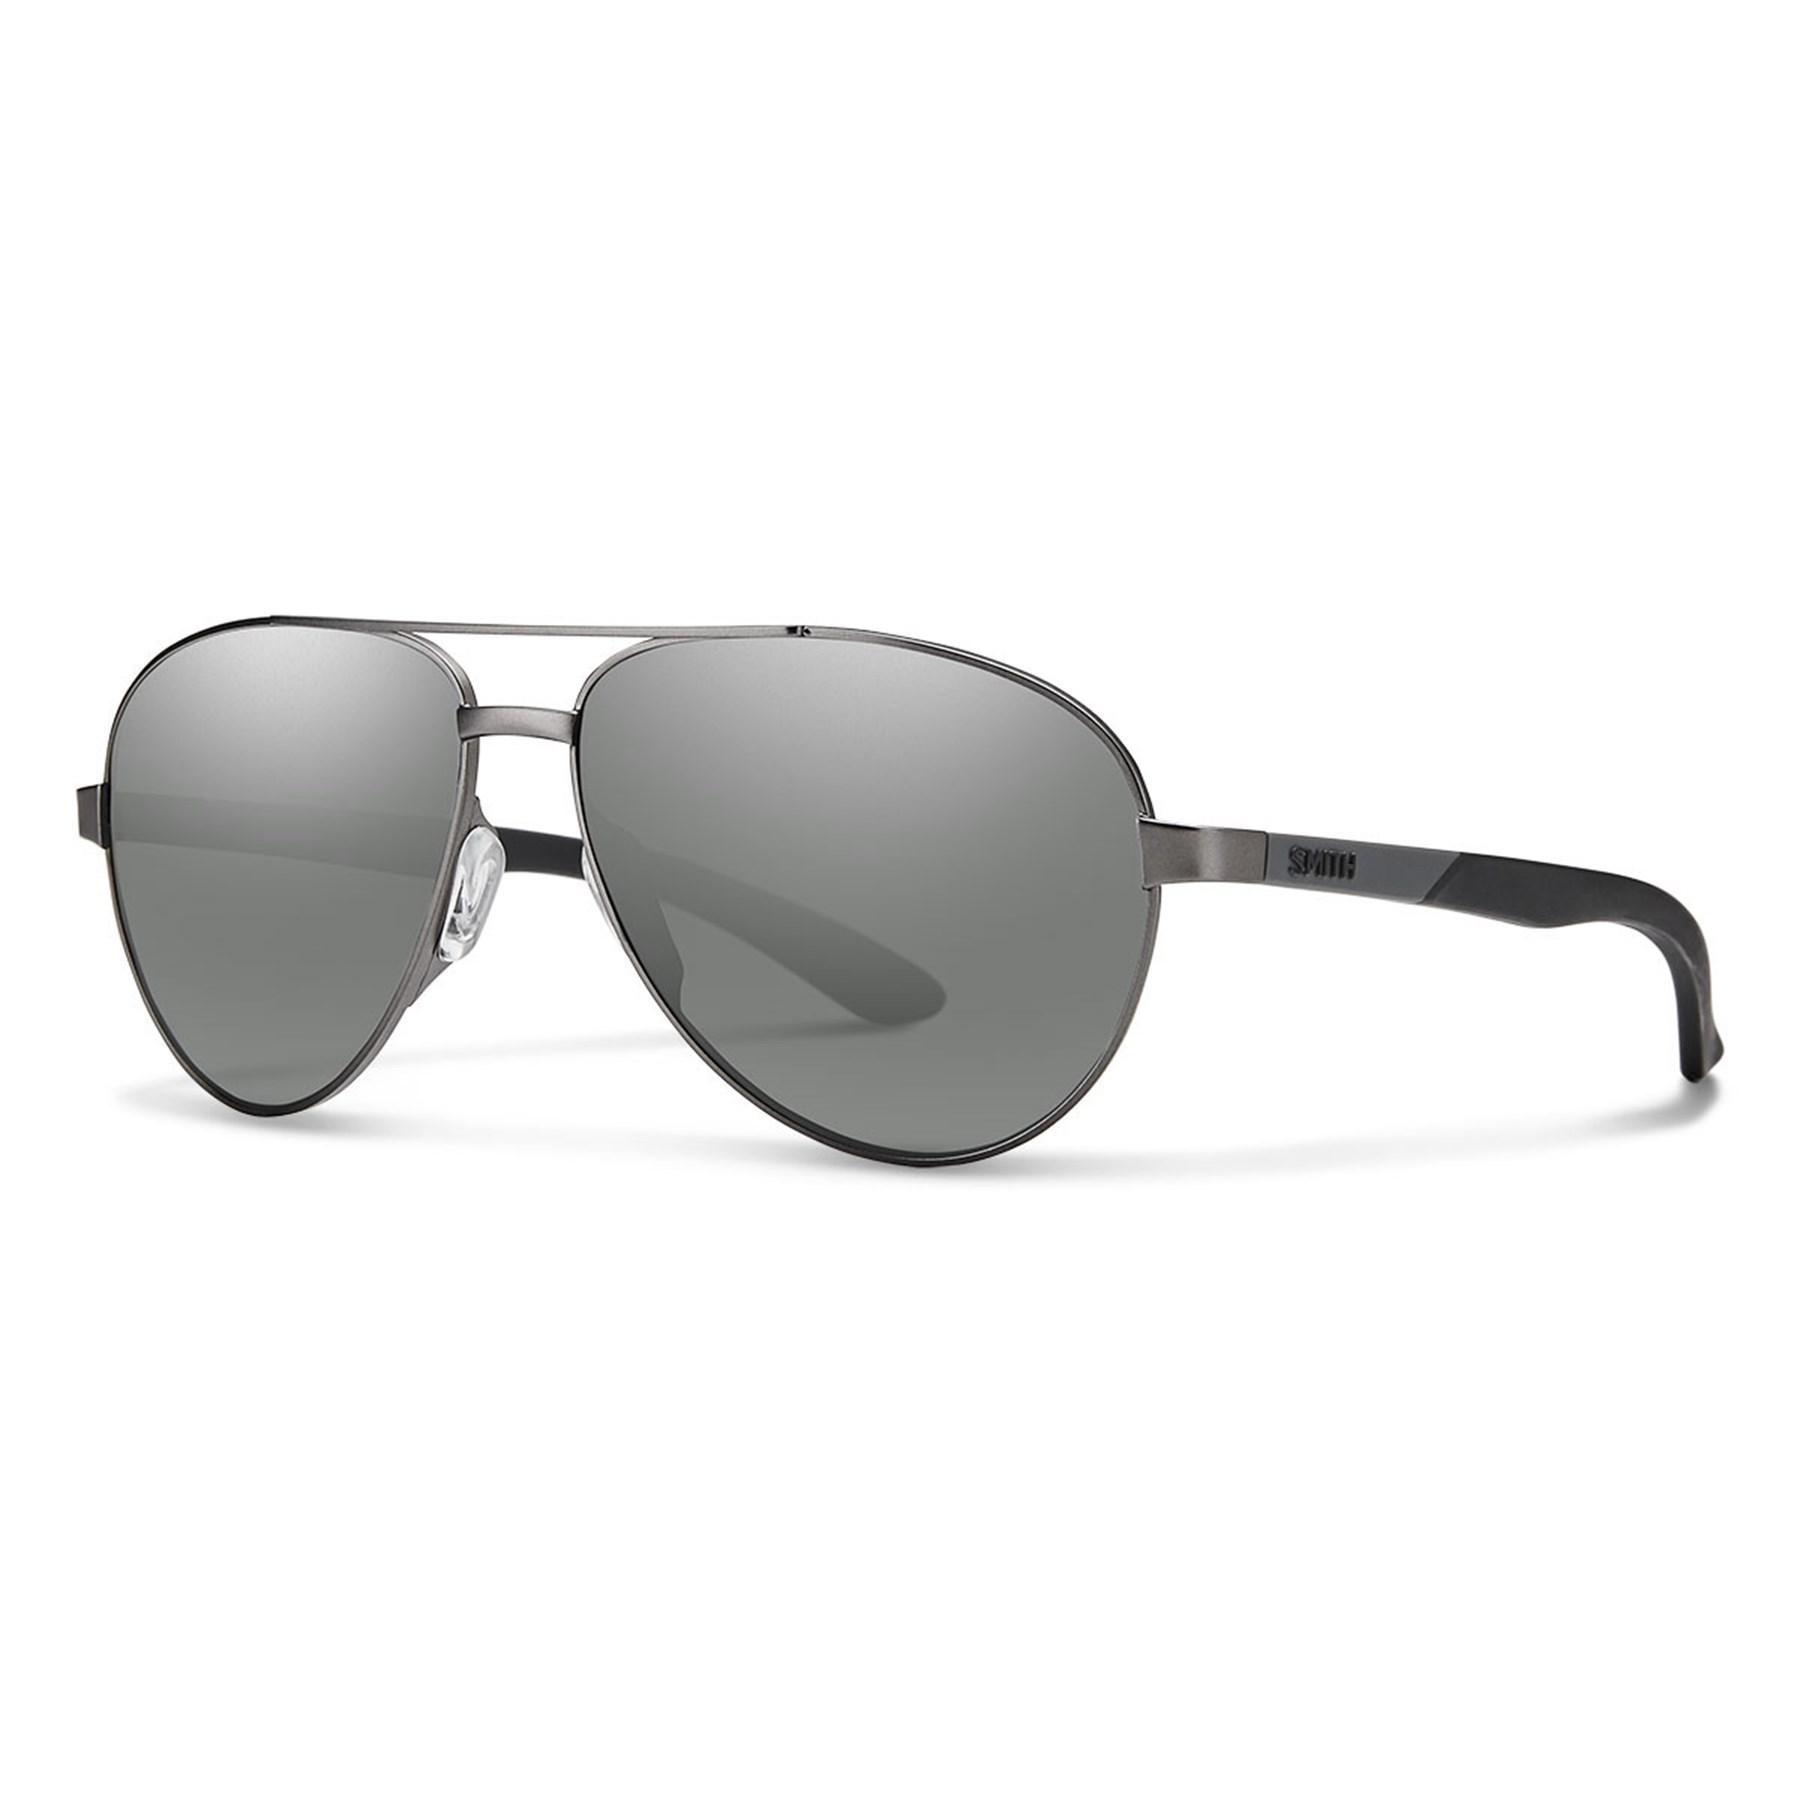 3189221644f1 Lyst - Smith Optics Salute Sunglasses (for Women) in Gray